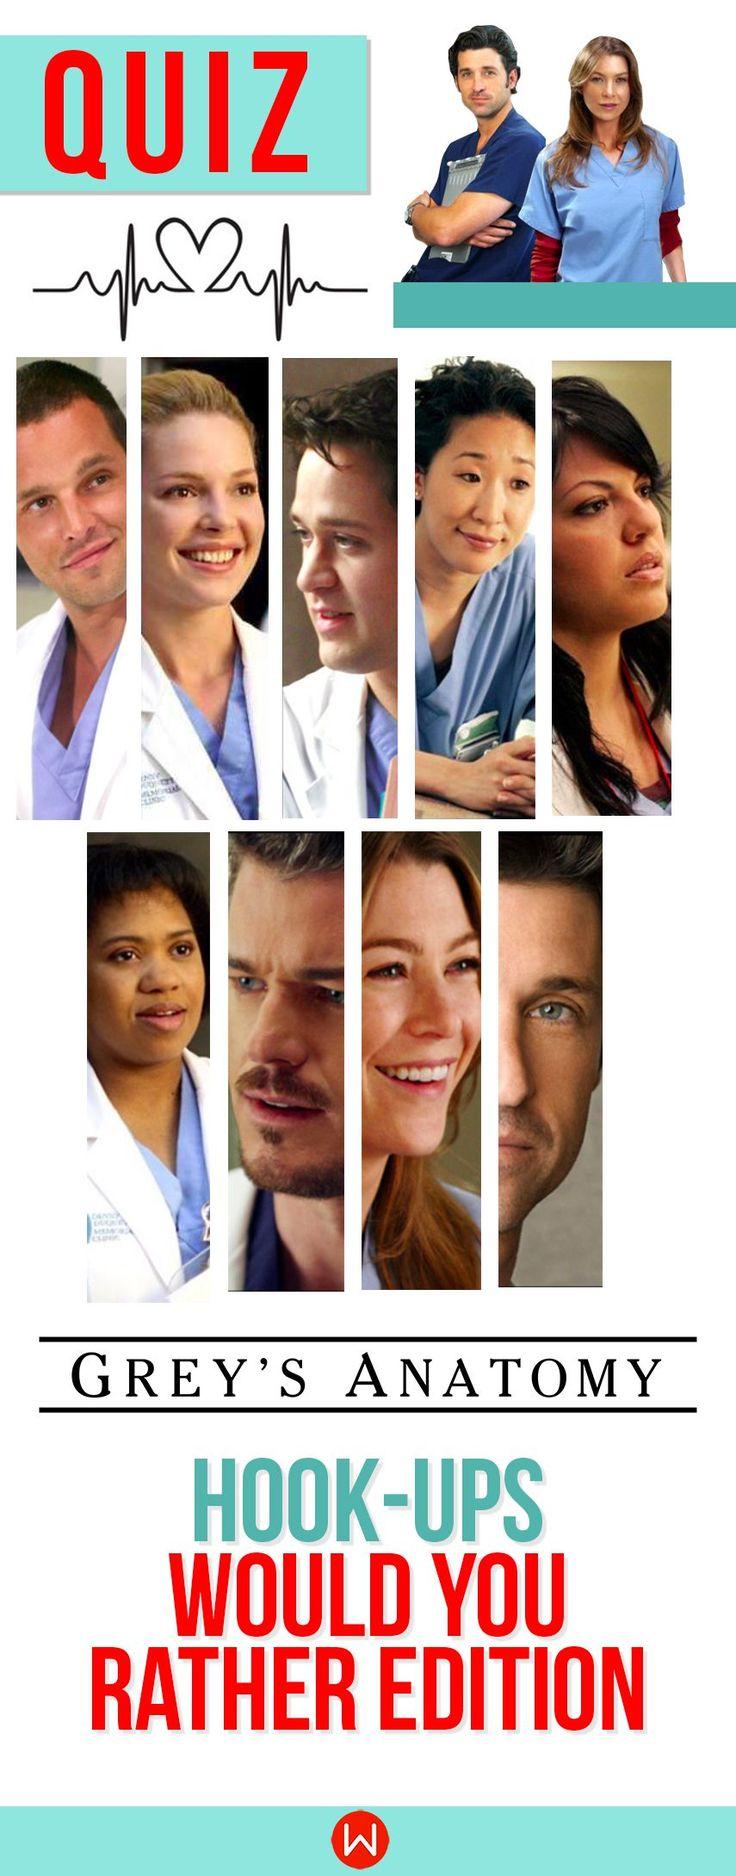 Grey's Anatomy Quiz: Would you rather...Hook-up edition! The toughest choice you'll have to make! Grey's Quiz, GA Trivia, GA Quiz, Meredith Grey, Shonda Rhimes, Shondaland, Grey's Anatomy Test, Buzzfeed Quizzes, Playbuzz Quiz